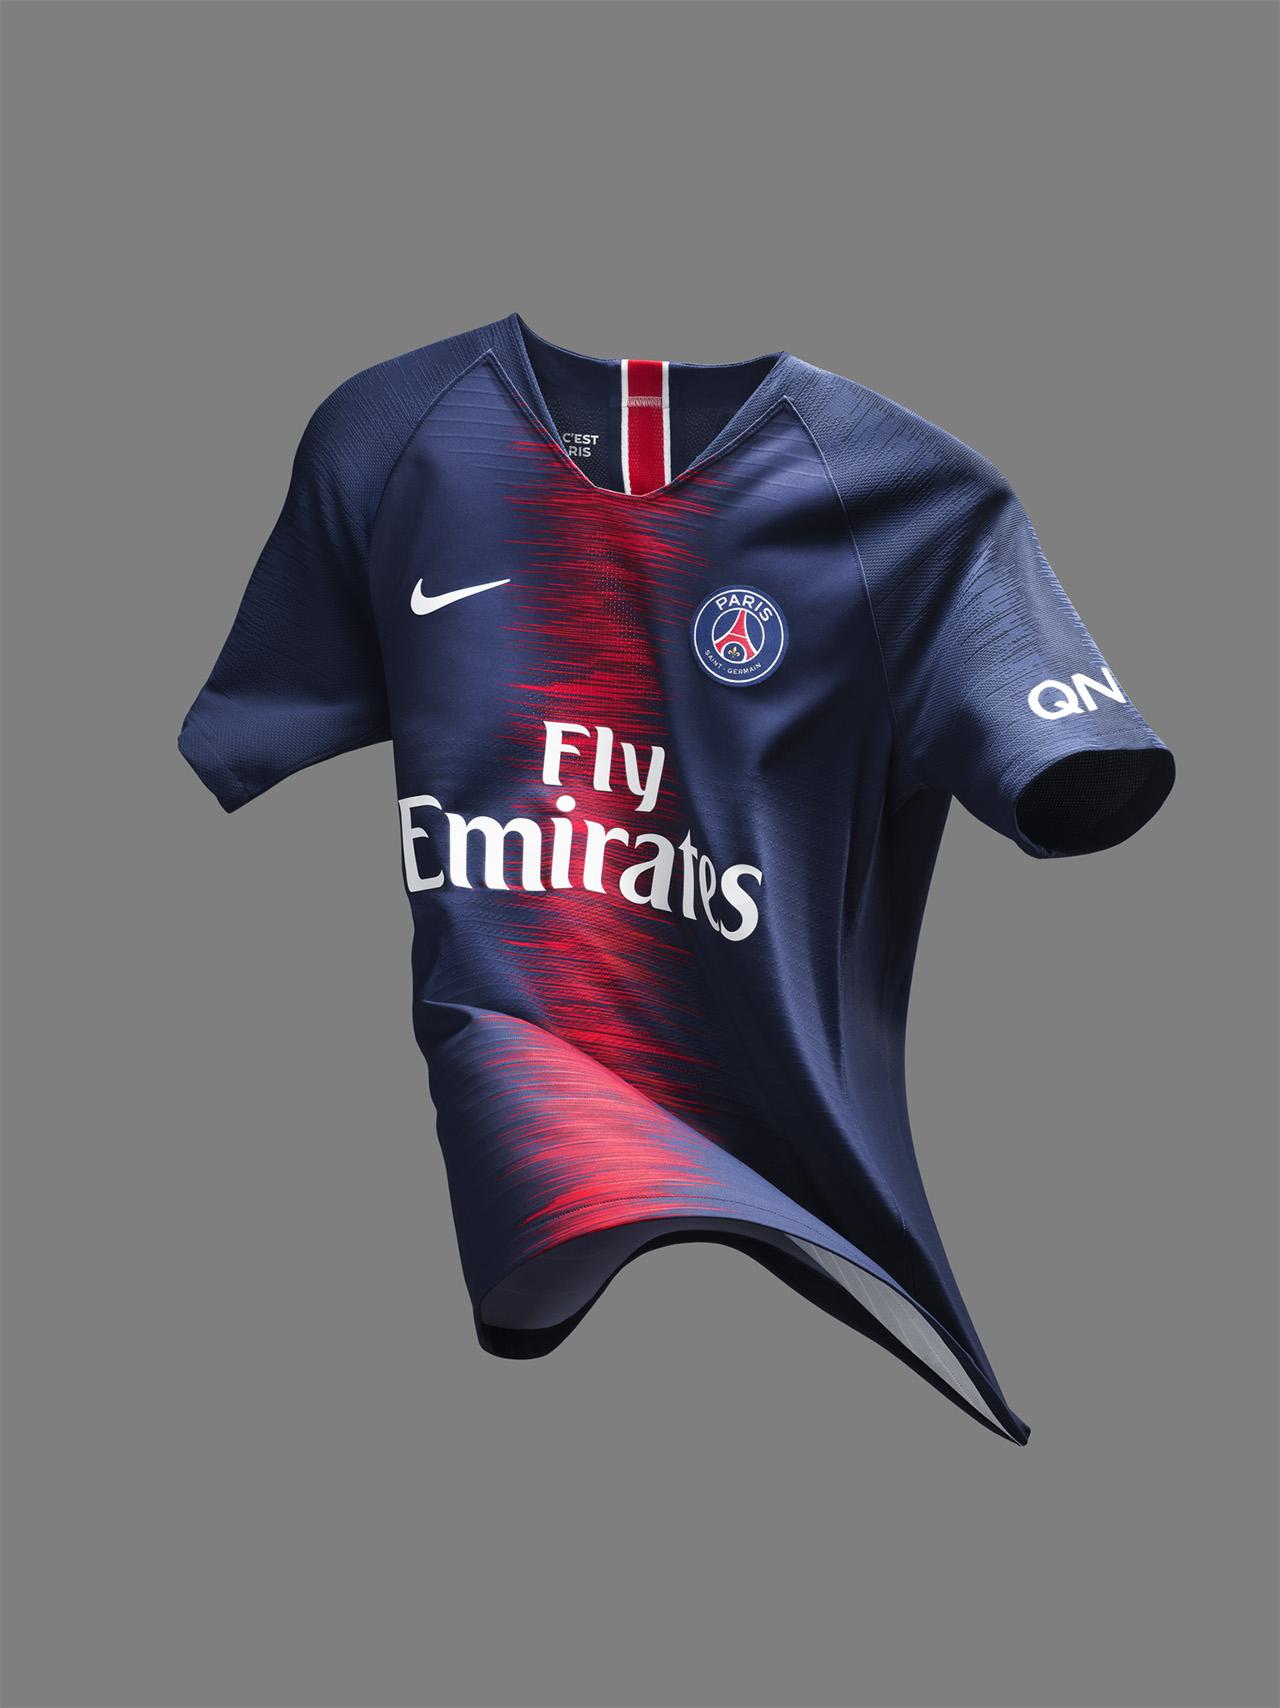 c0478ee990 Camisa Nike PARIS SAINT GERMAIN 18 19 Home TORCEDOR - Müller Sports ...